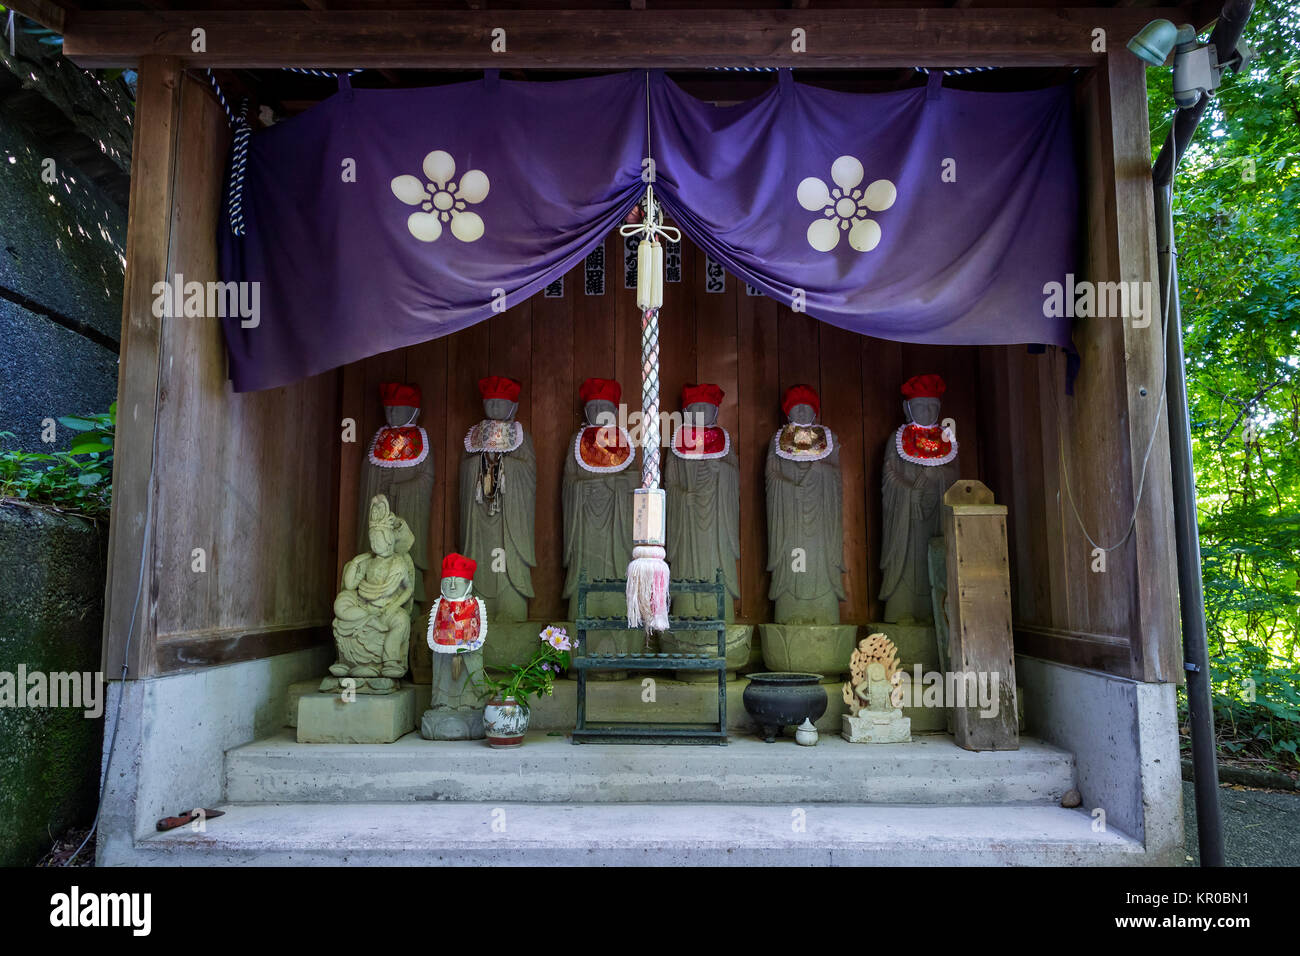 Kanazawa - Japan, June 11, 2017: Shinto shrine at the stairs to the Utatsuyama Temple Area, Spiritual Road, in Kanazawa - Stock Image